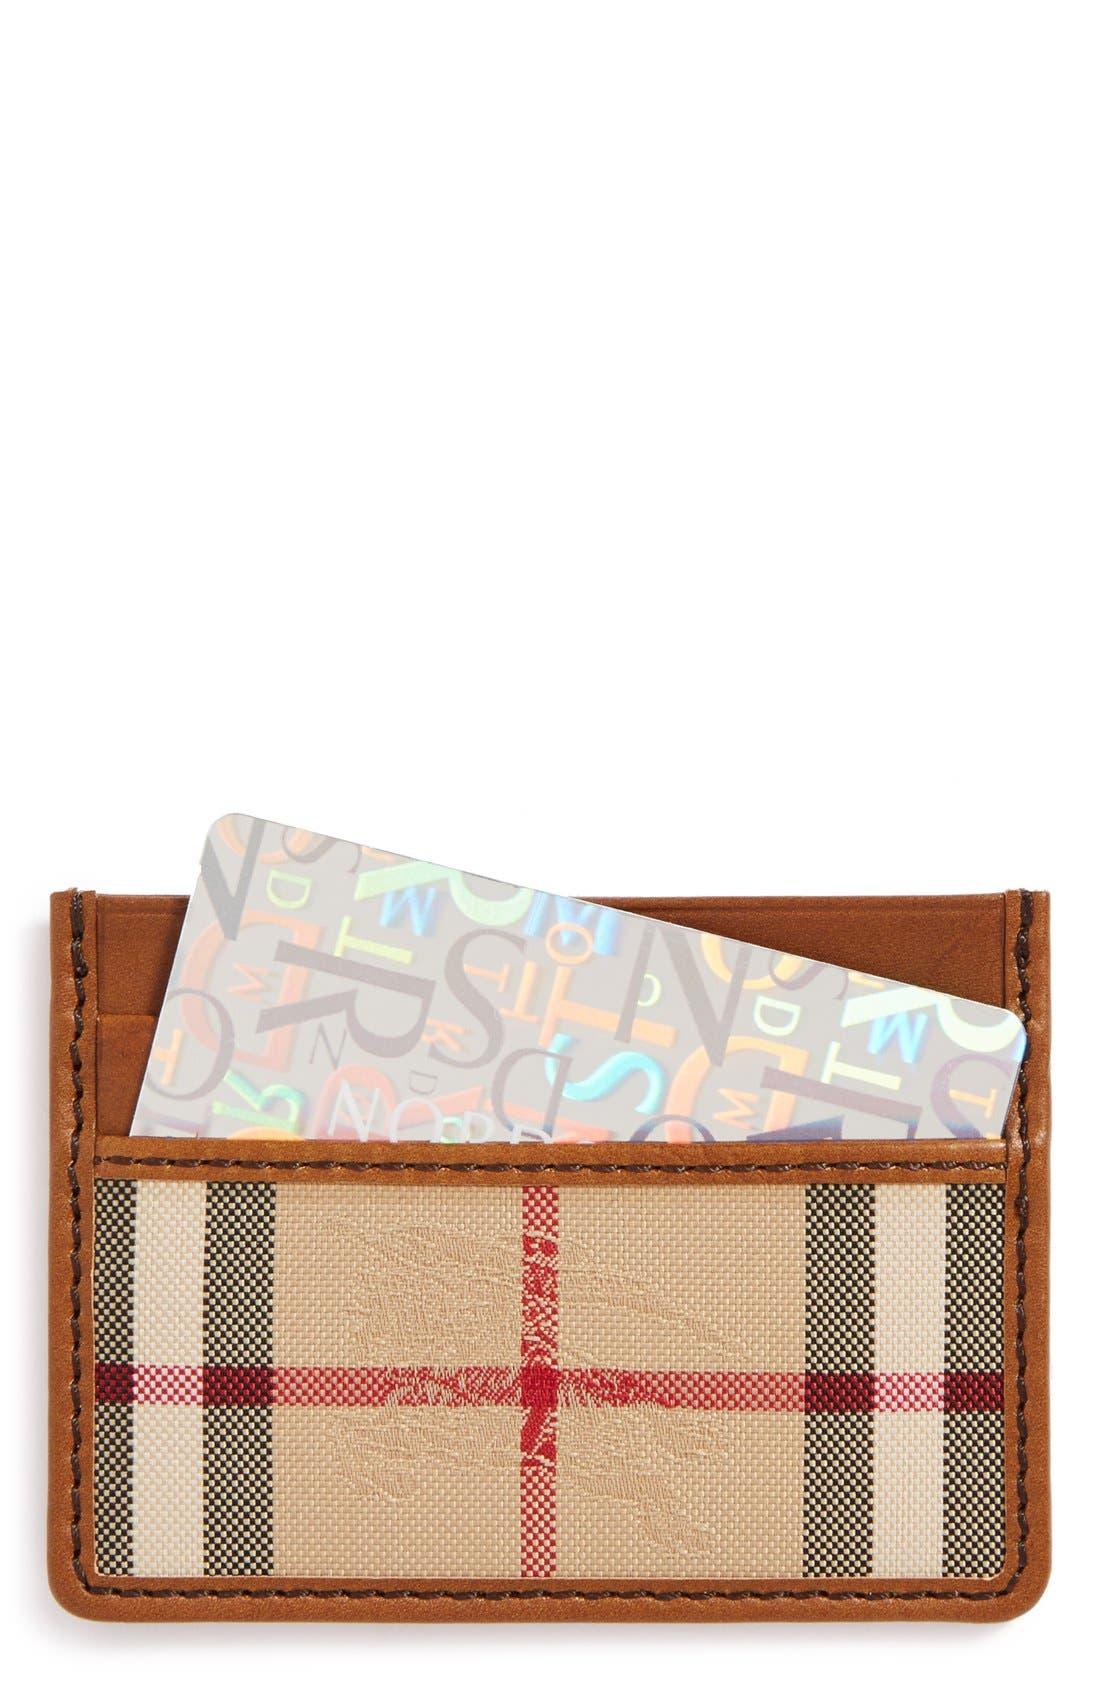 Main Image - Burberry Sandon Horseferry Check Card Case